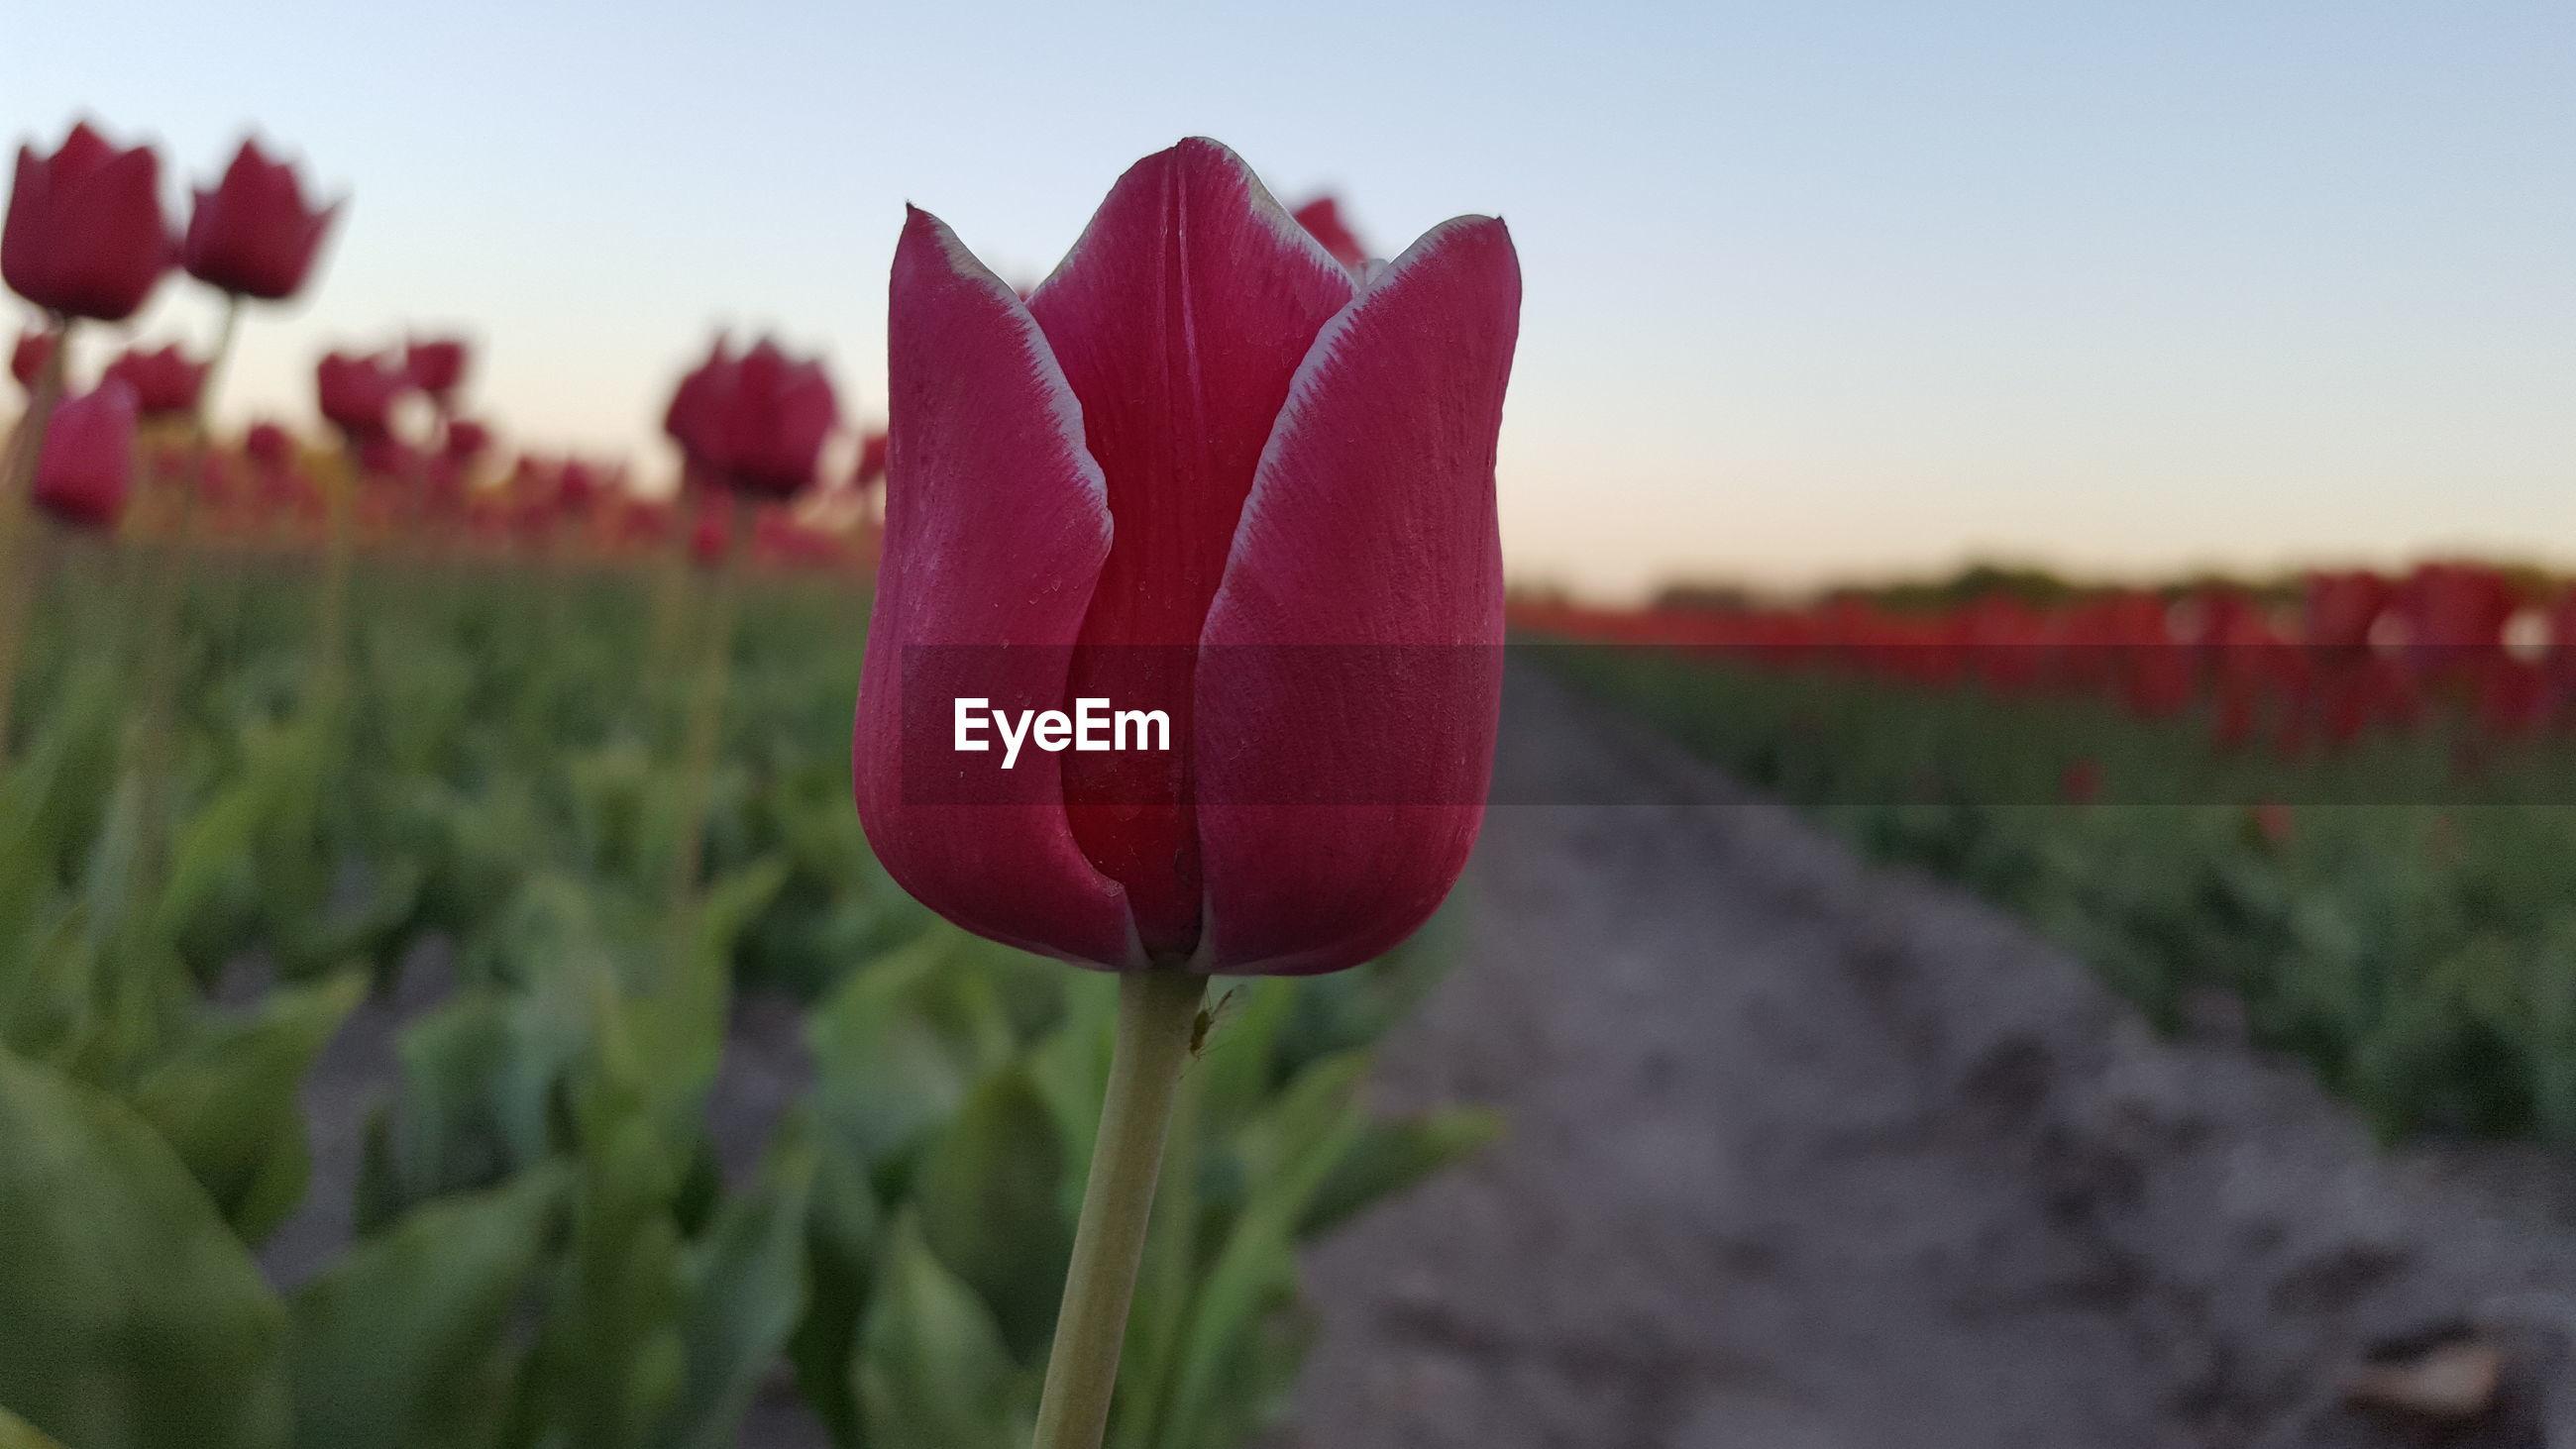 CLOSE-UP OF PURPLE TULIP FLOWER ON FIELD